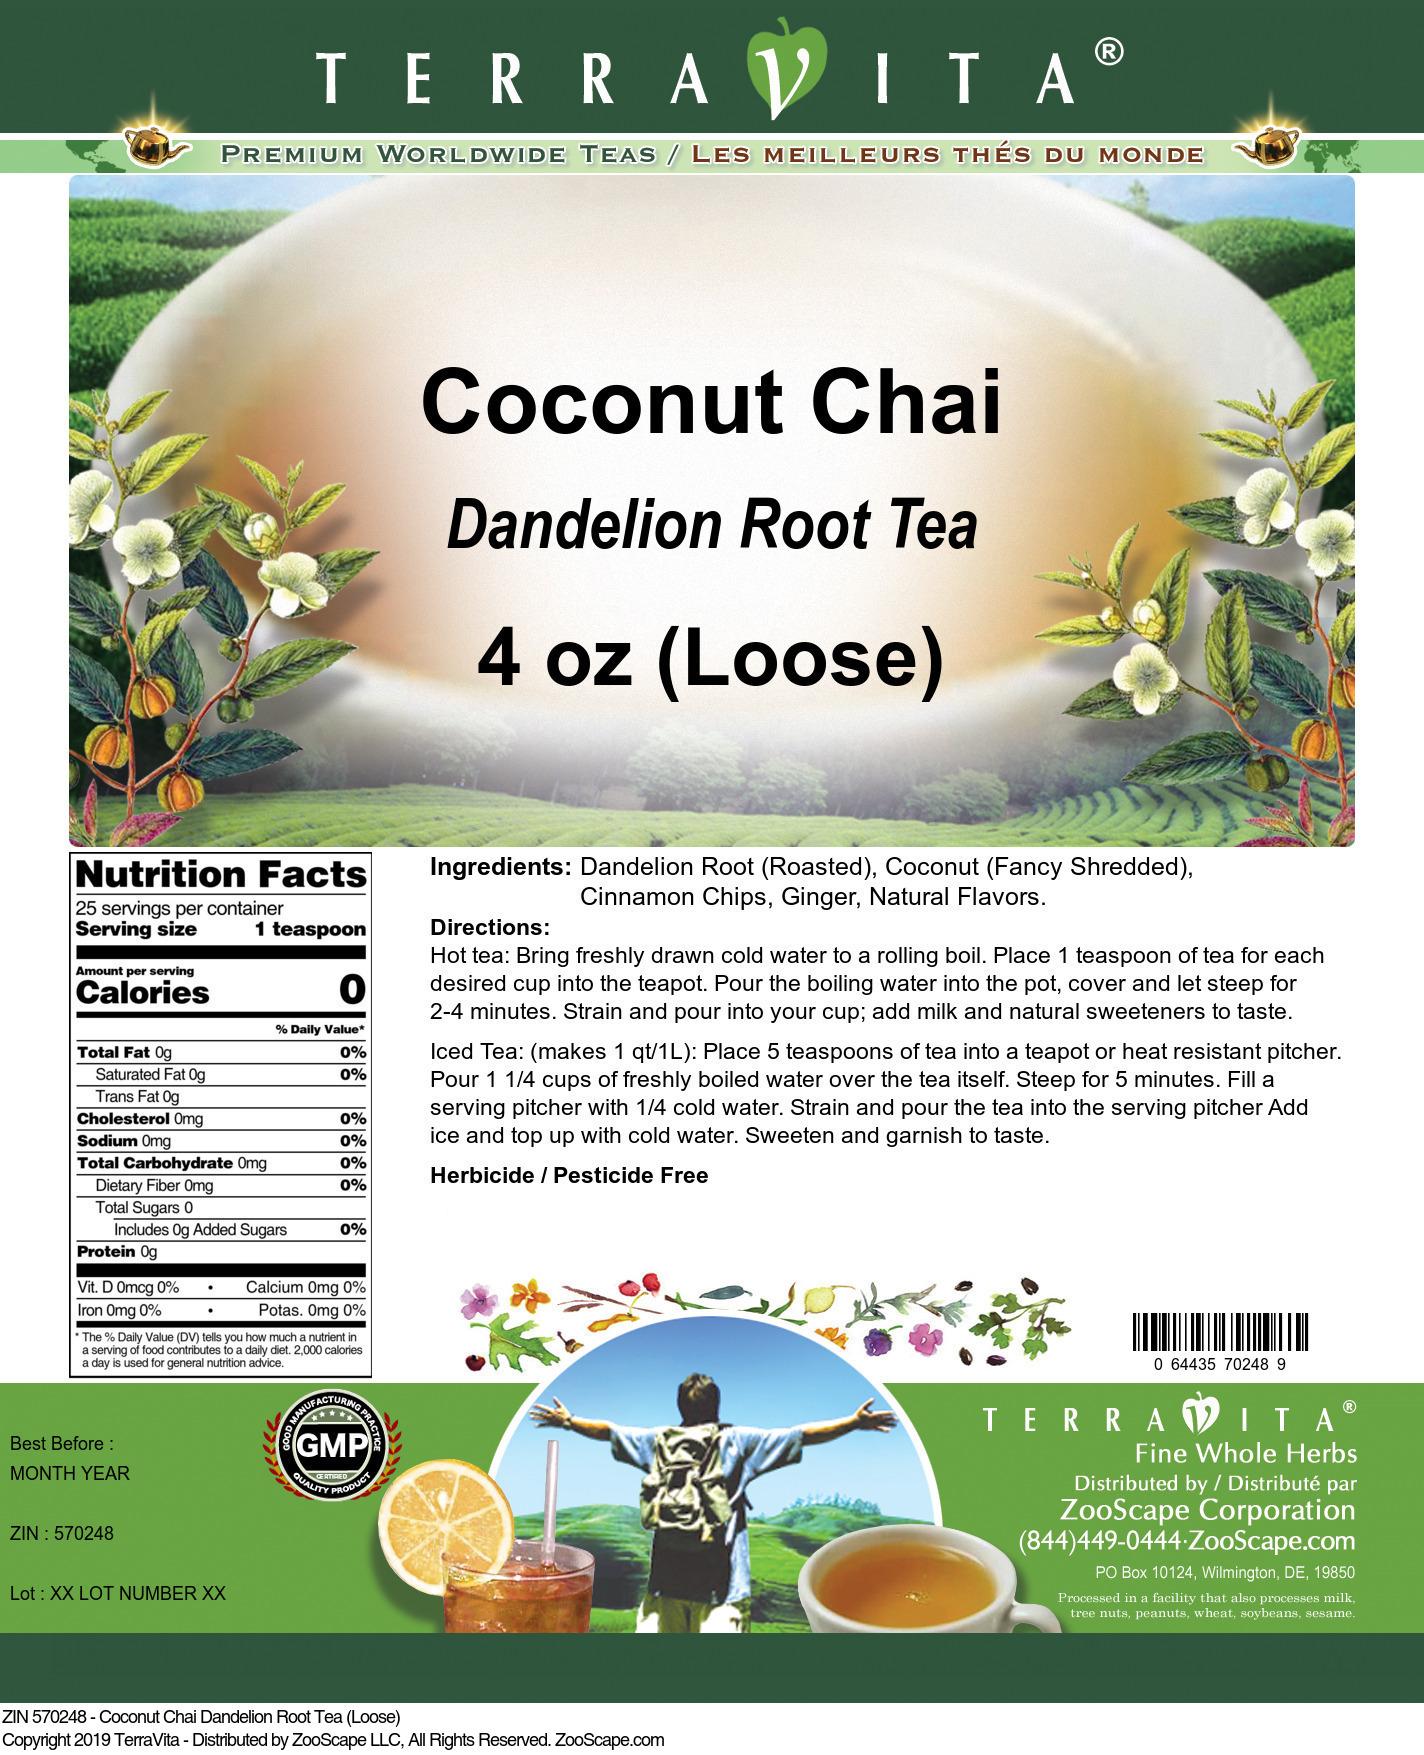 Coconut Chai Dandelion Root Tea (Loose)